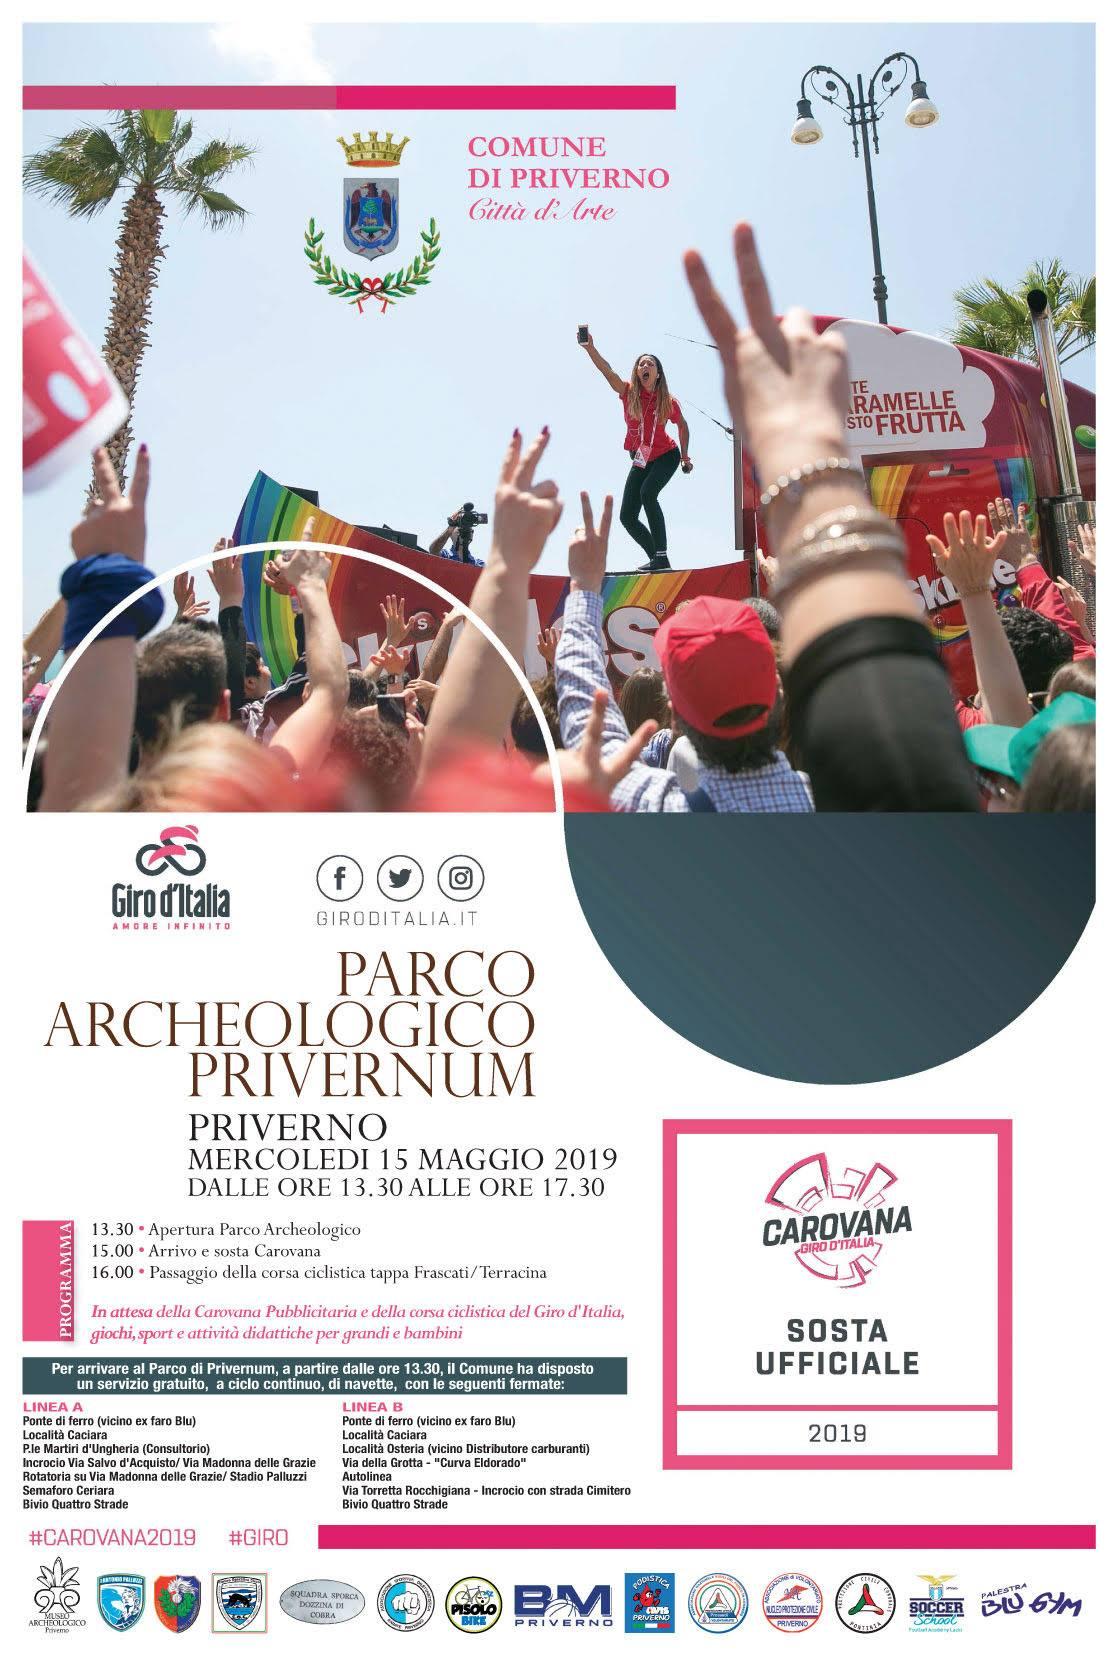 Priverno: Parco archeologico Privernum @ parco archeologico | Priverno | Lazio | Italia